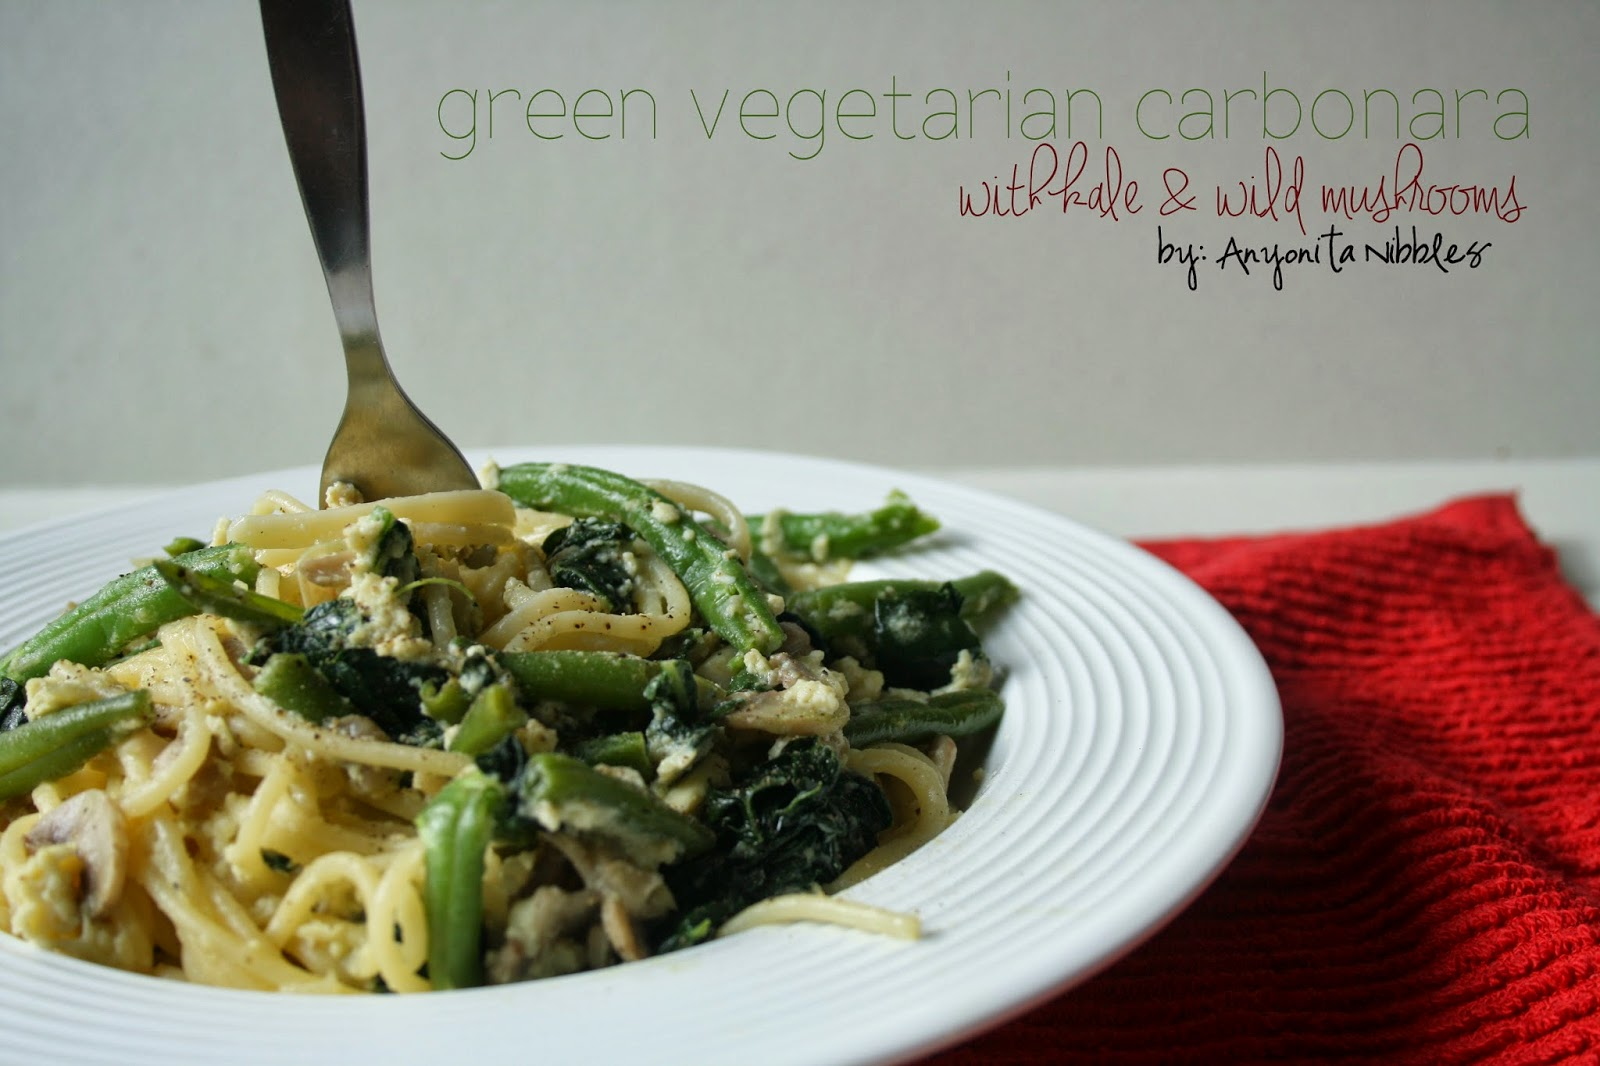 Green Vegetarian Carbonara with Kale and Mushrooms | Anyonita Nibbles